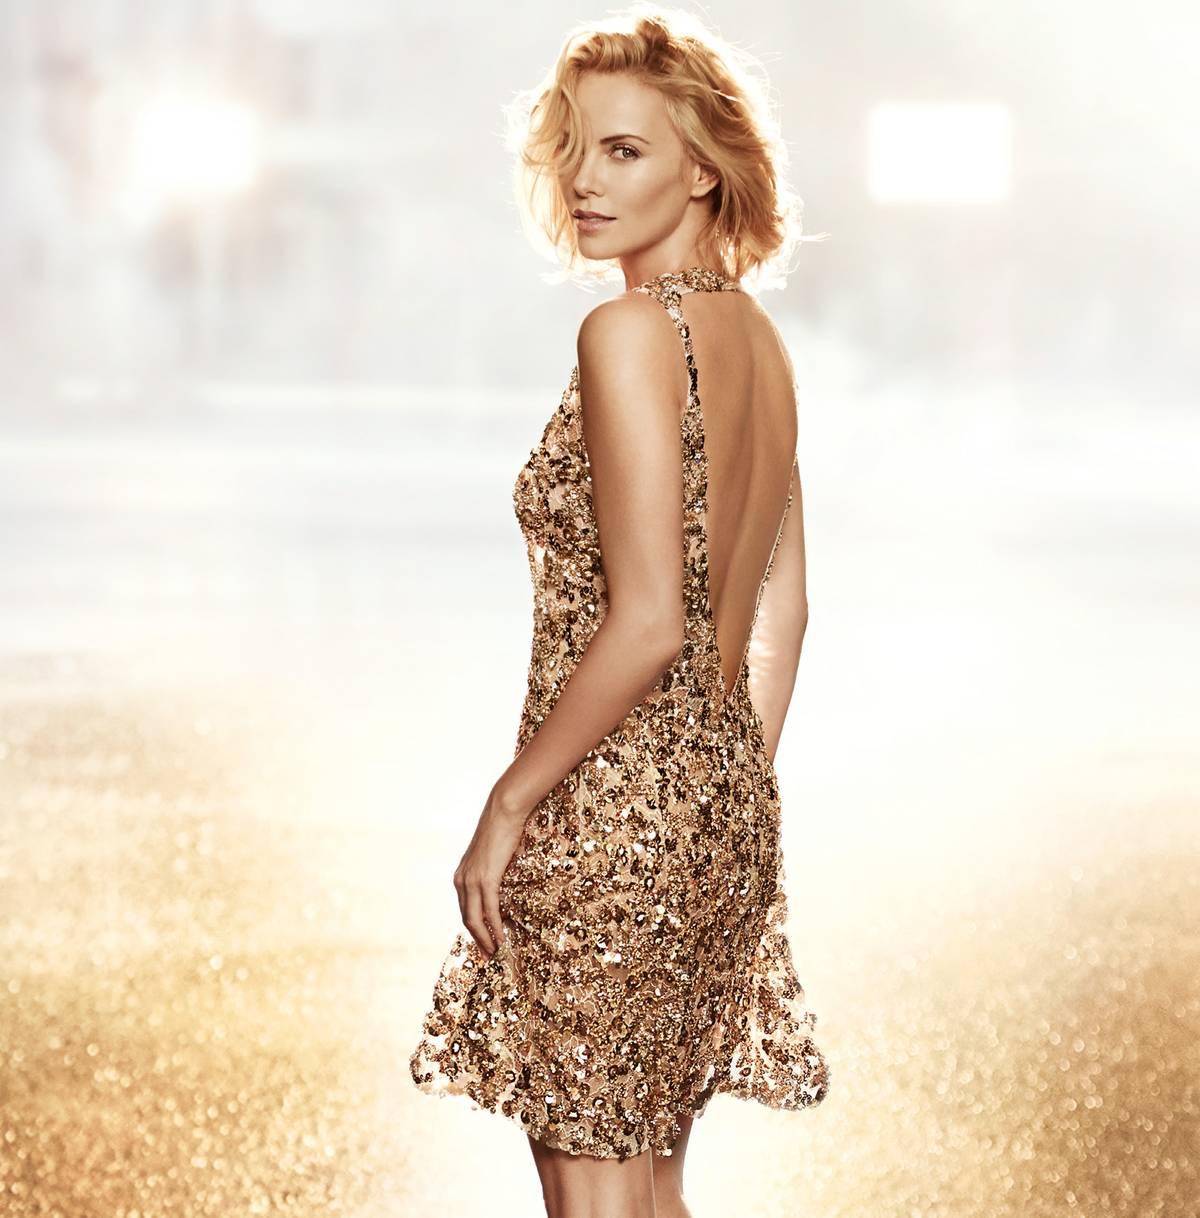 Charlize Theron Returns For Dior J Adore Eau Lumi 232 Re